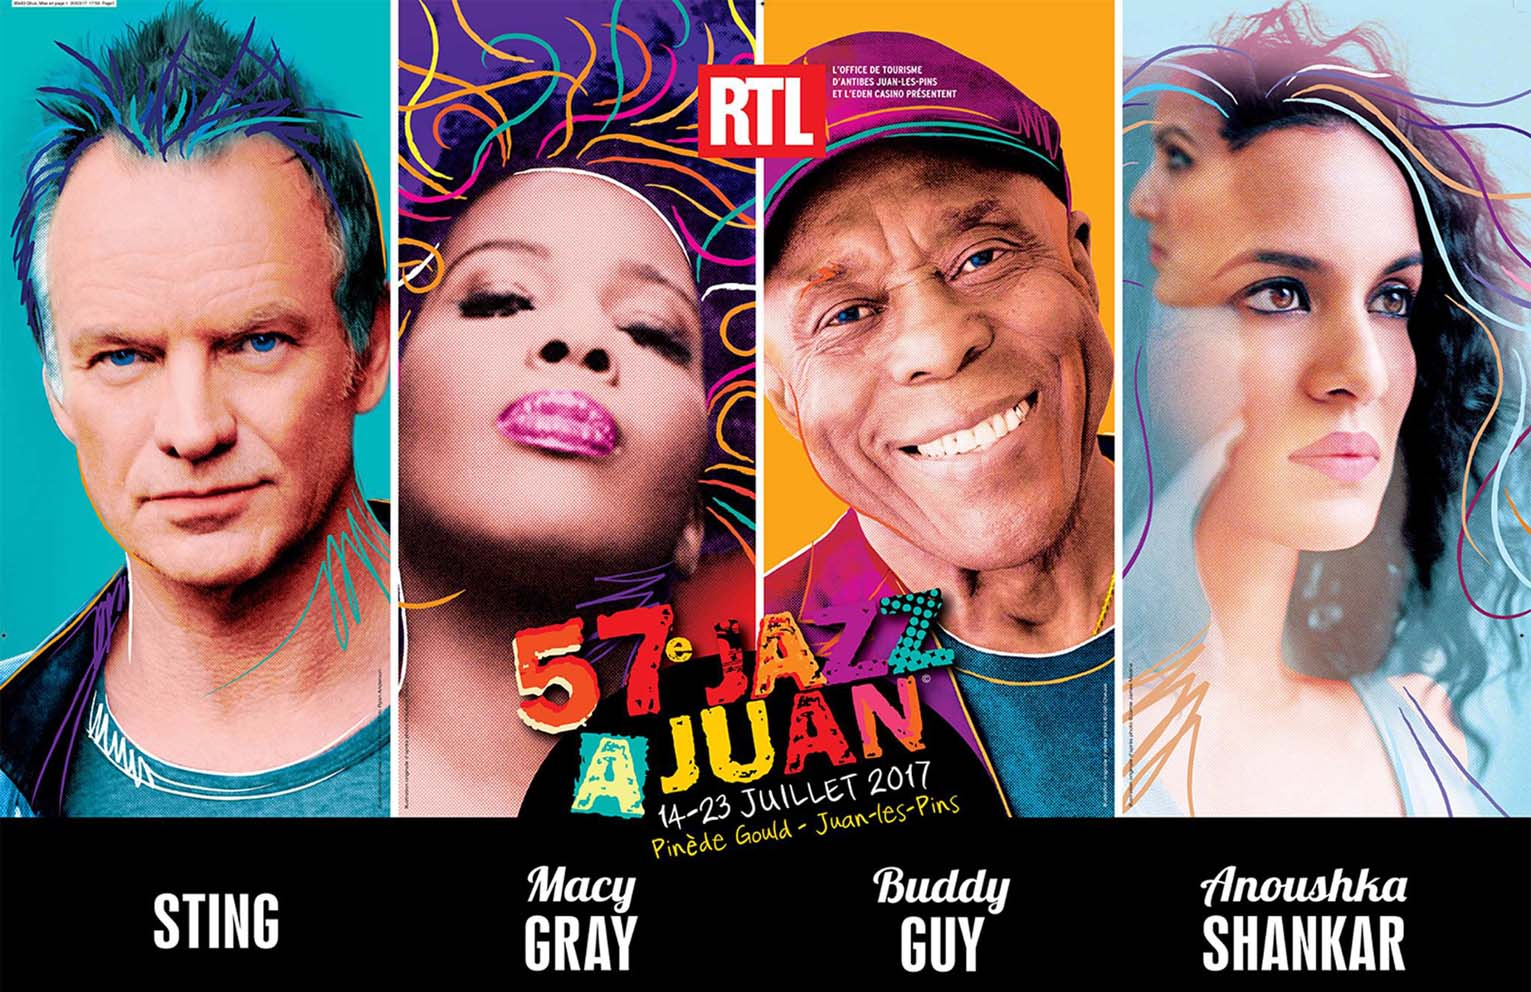 57e-Festival-Jazz-à-Juan-2017-Sting-Macy-Gray-Buddy-Guy-Anoushka-Shankar-en-concert-Cote-d-Azur-Antibes-Juan-les-Pins-Blog-Mister-Riviera-20